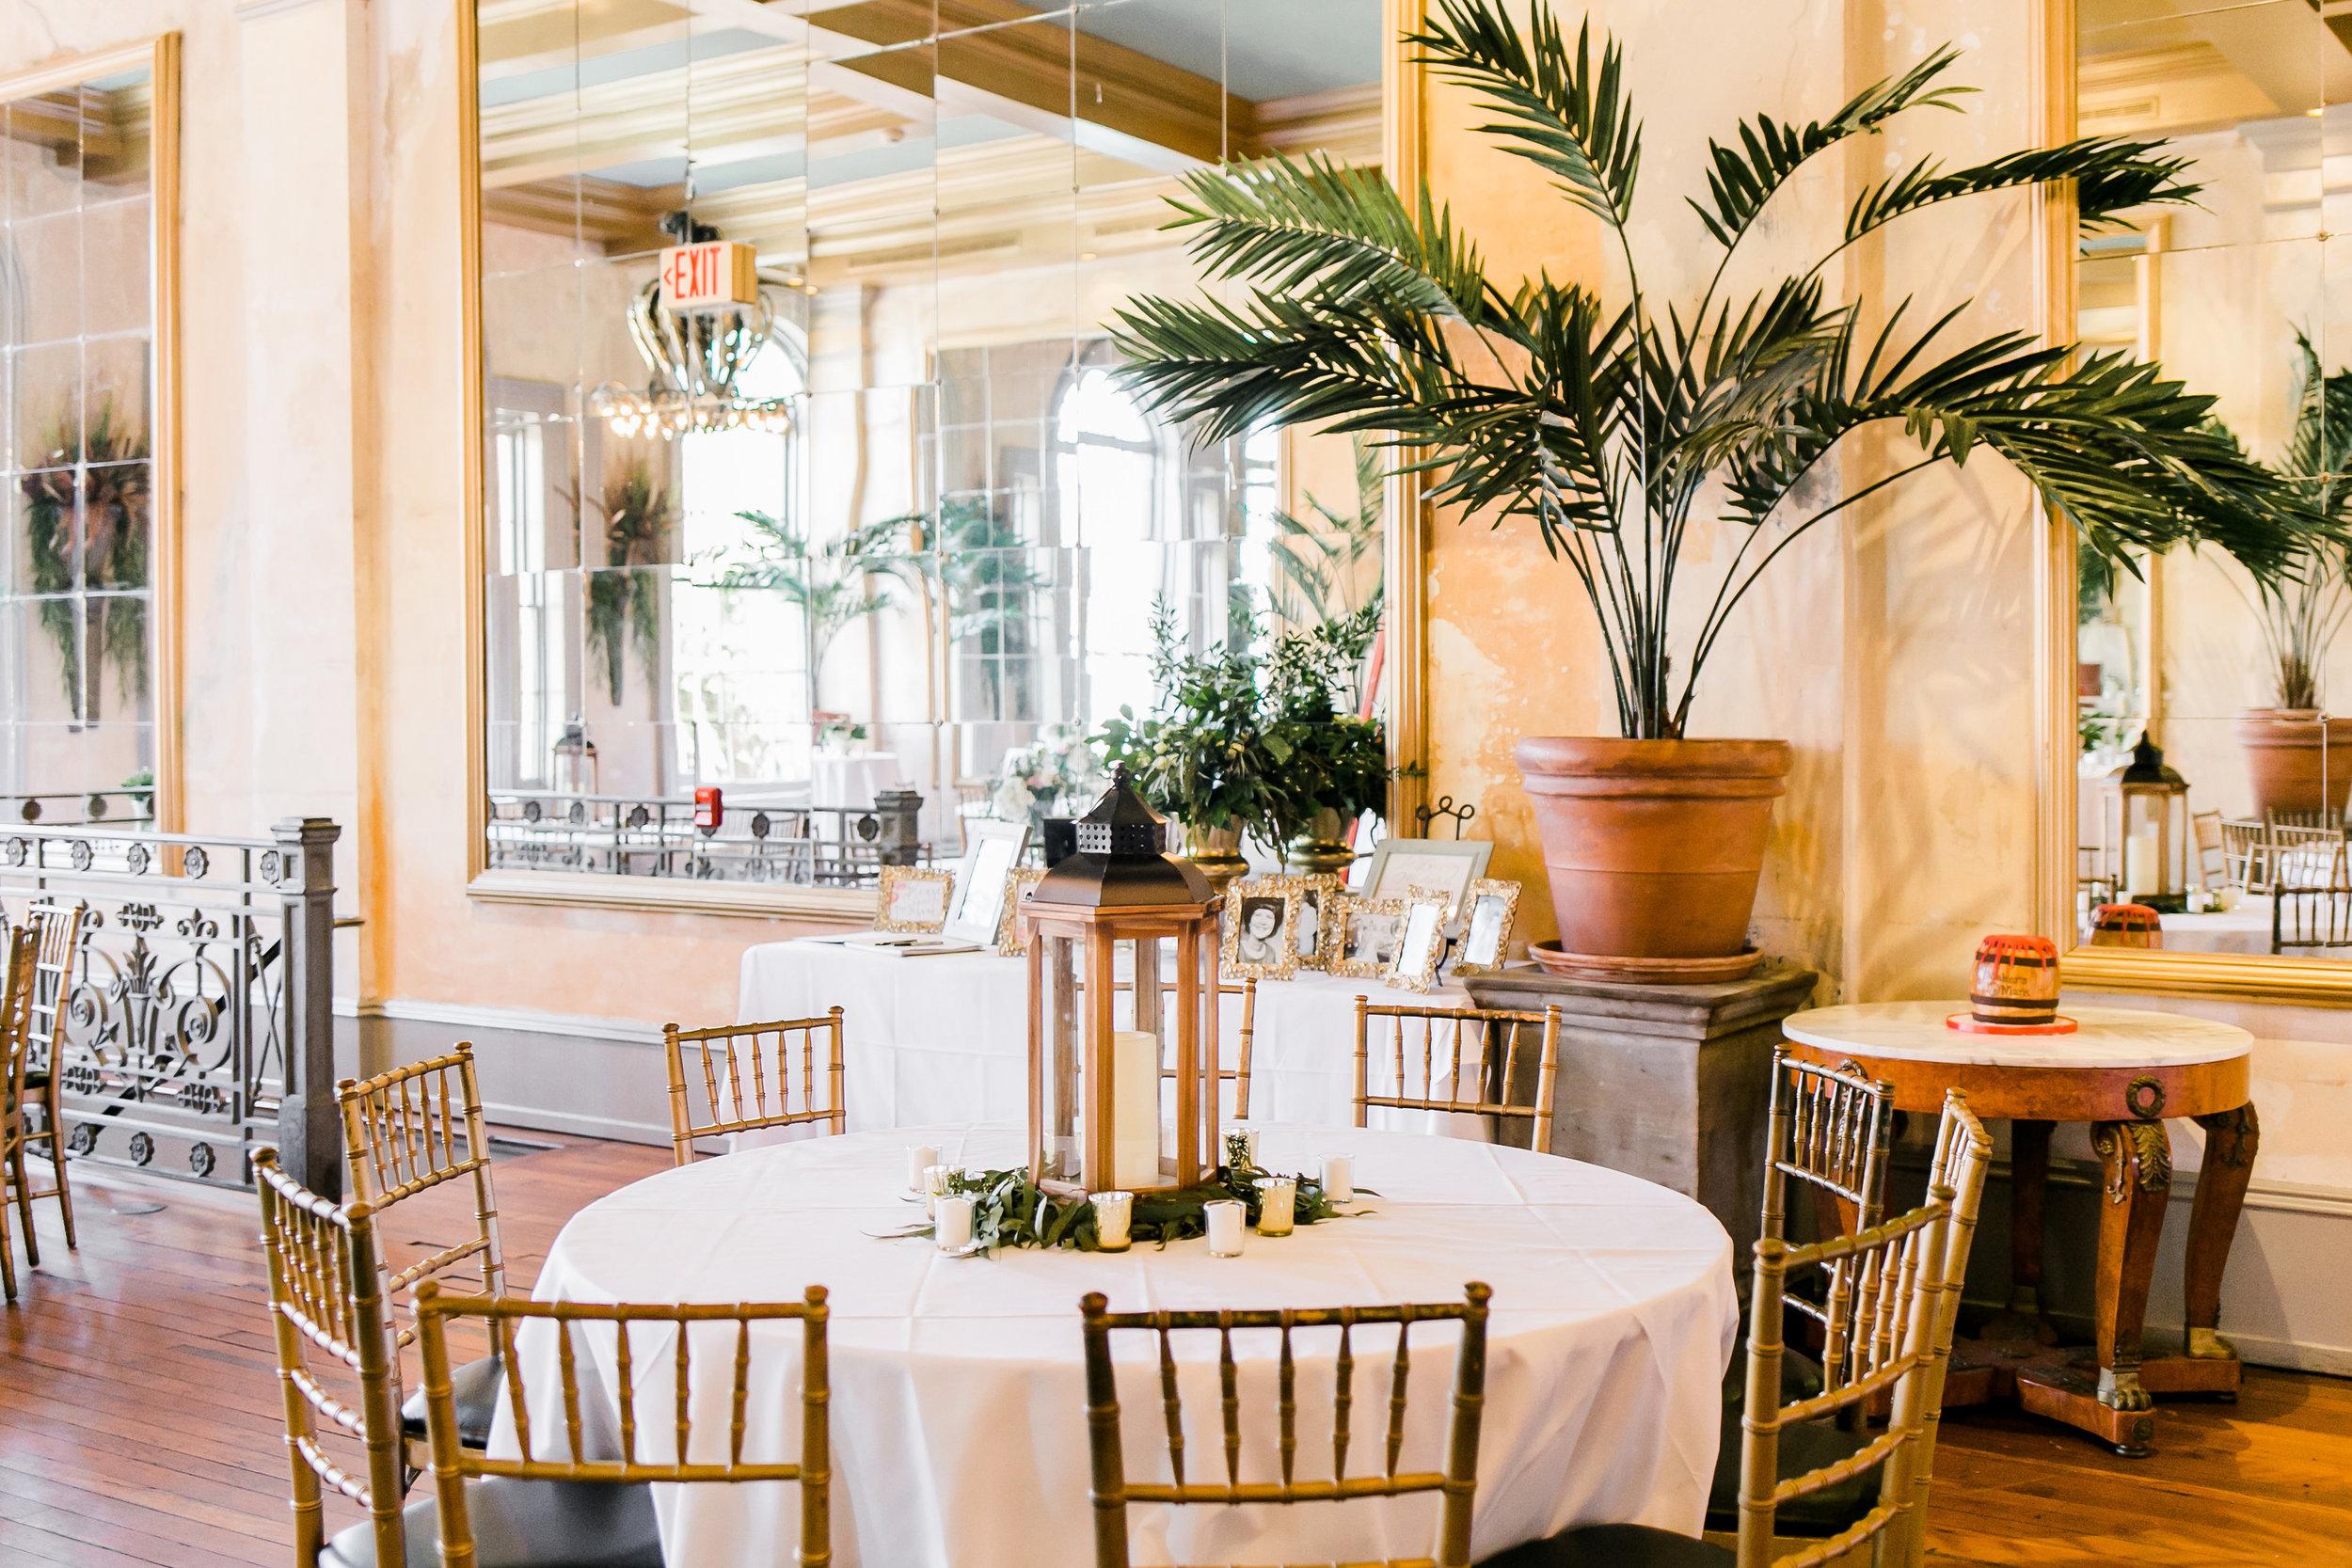 Garibaldi's Cafe wedding reception in Savannah GA by Jb Marie Photography